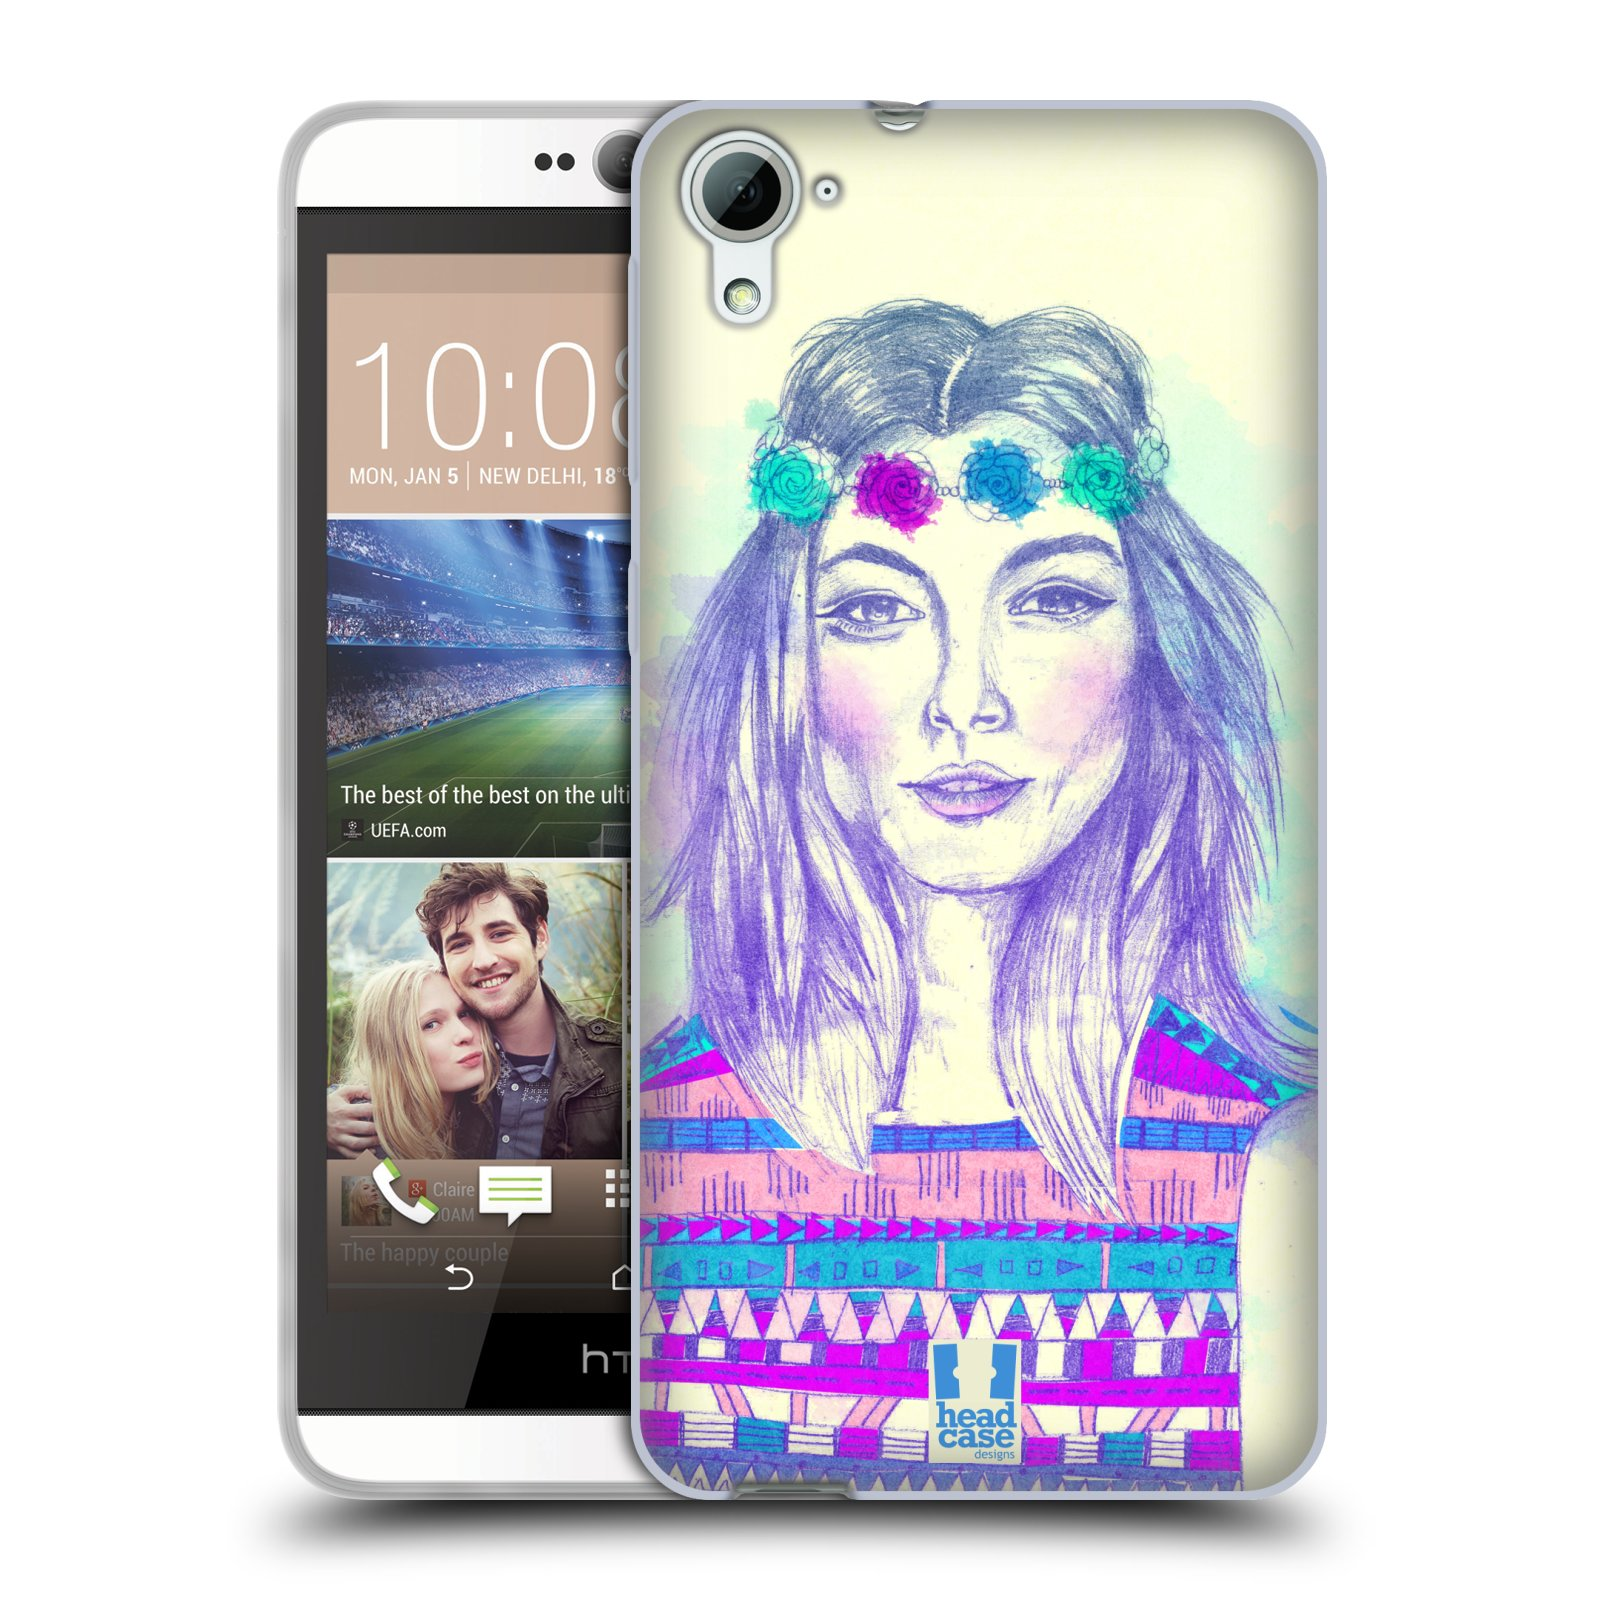 HEAD CASE silikonový obal na mobil HTC DESIRE 826 vzor Dívka dlouhé květinové vlasy HIPPIE modrá